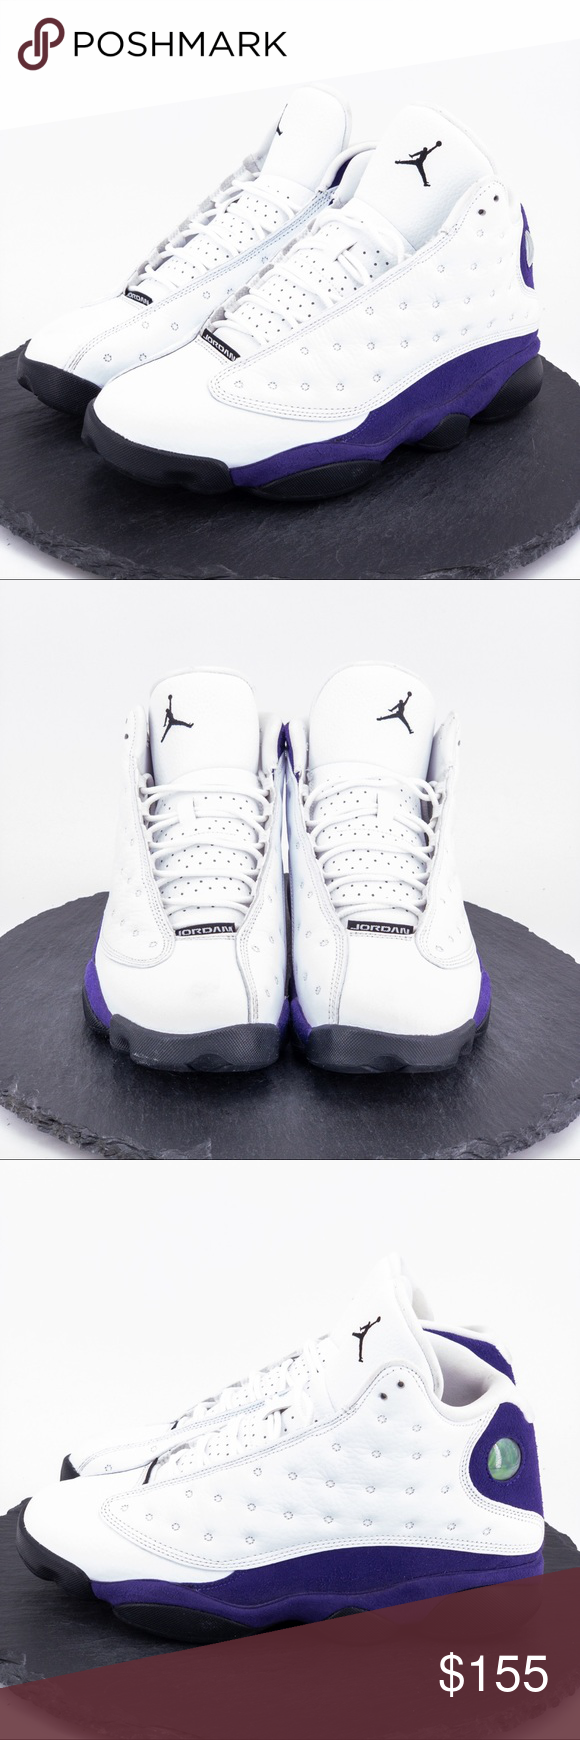 Jordan Retro XIII Lakers Mens Size 10.5